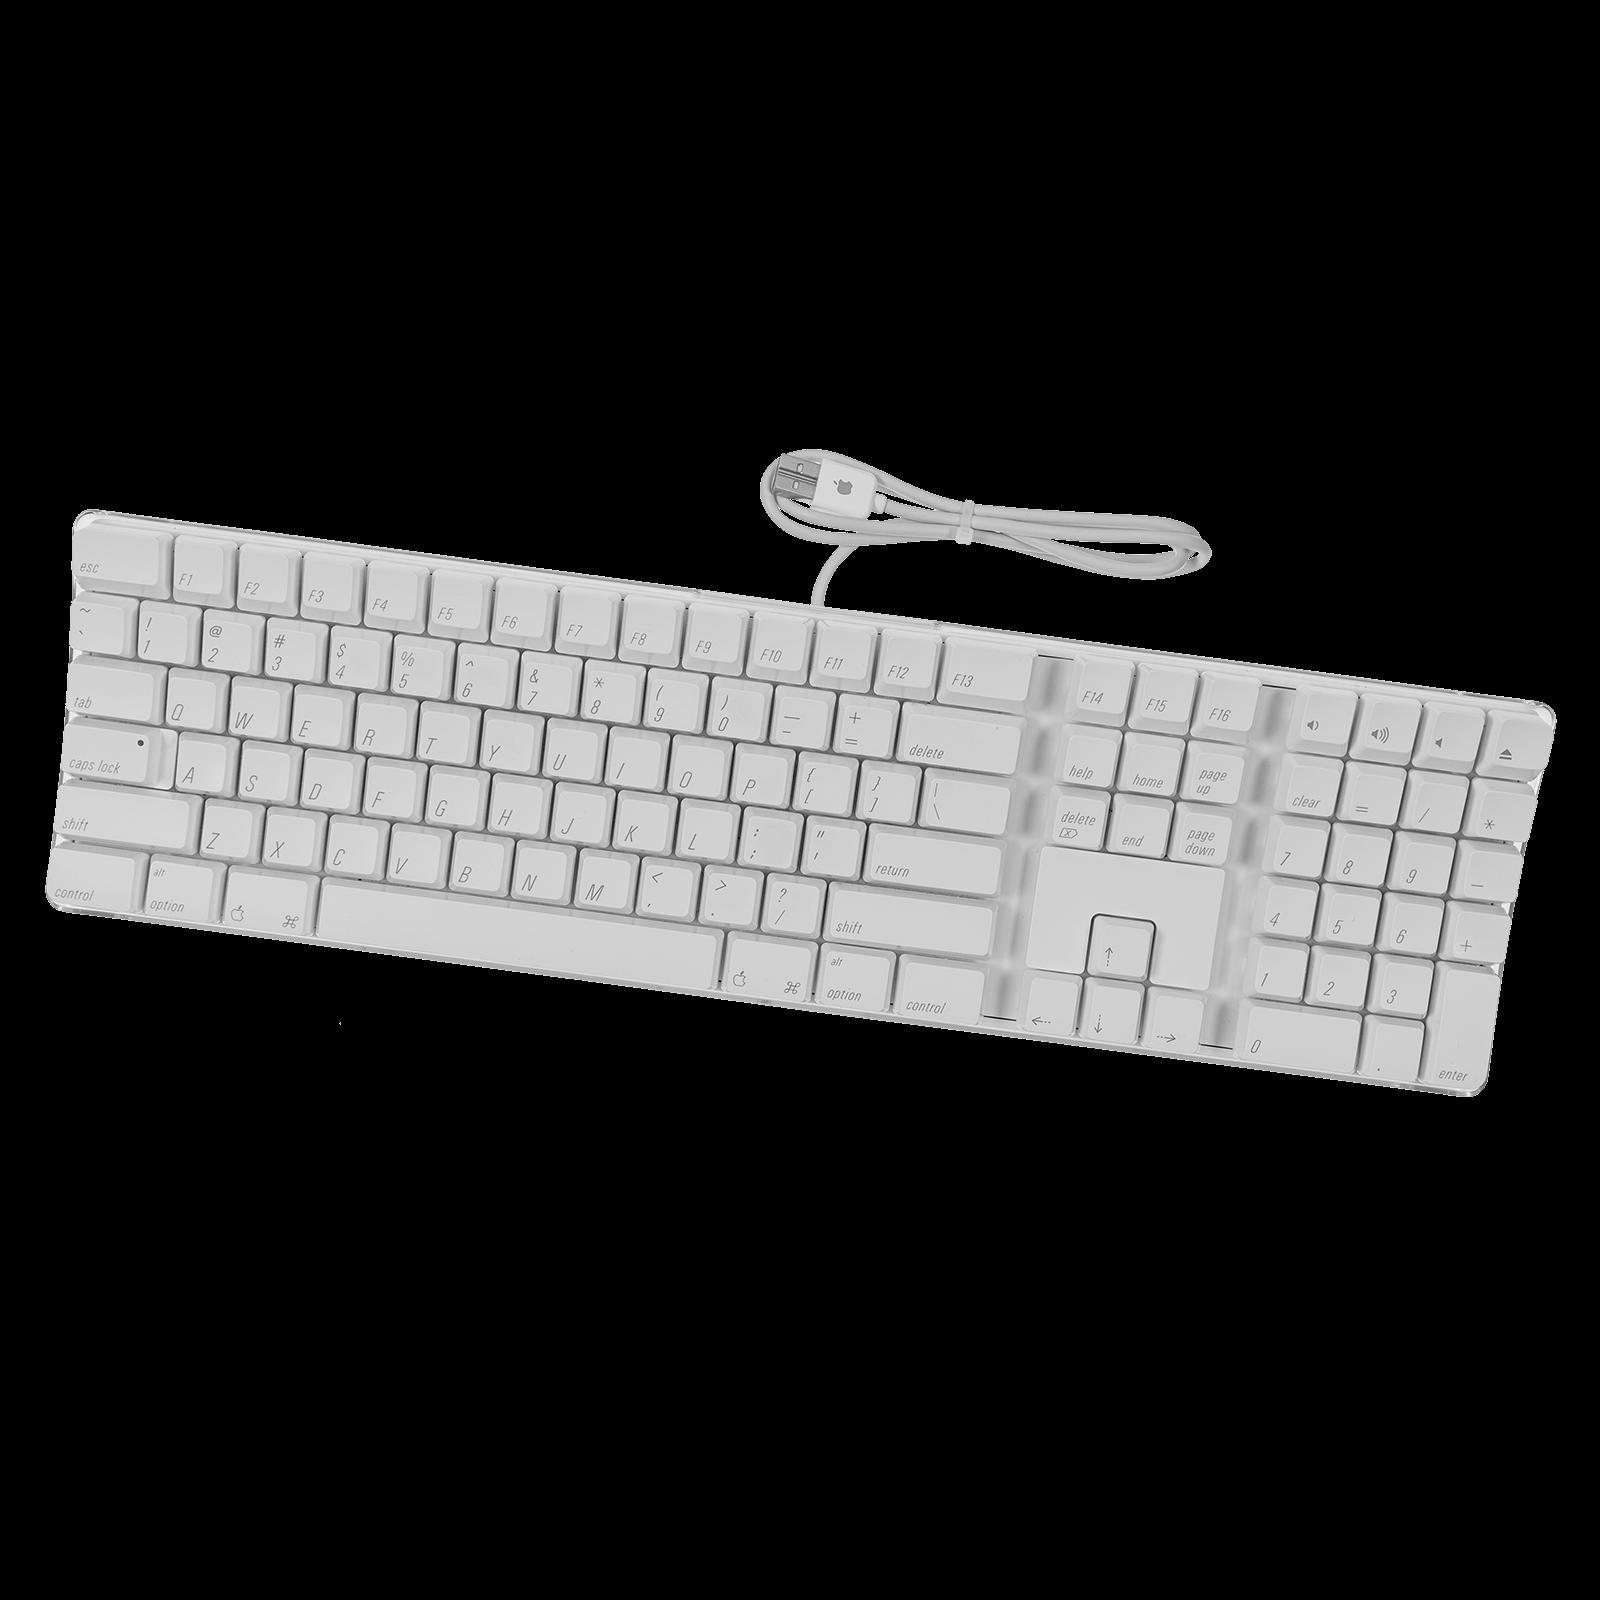 M9034LL/A) Apple Wired Keyboard + Keypad & USB Ports (A1048) » Beetstech